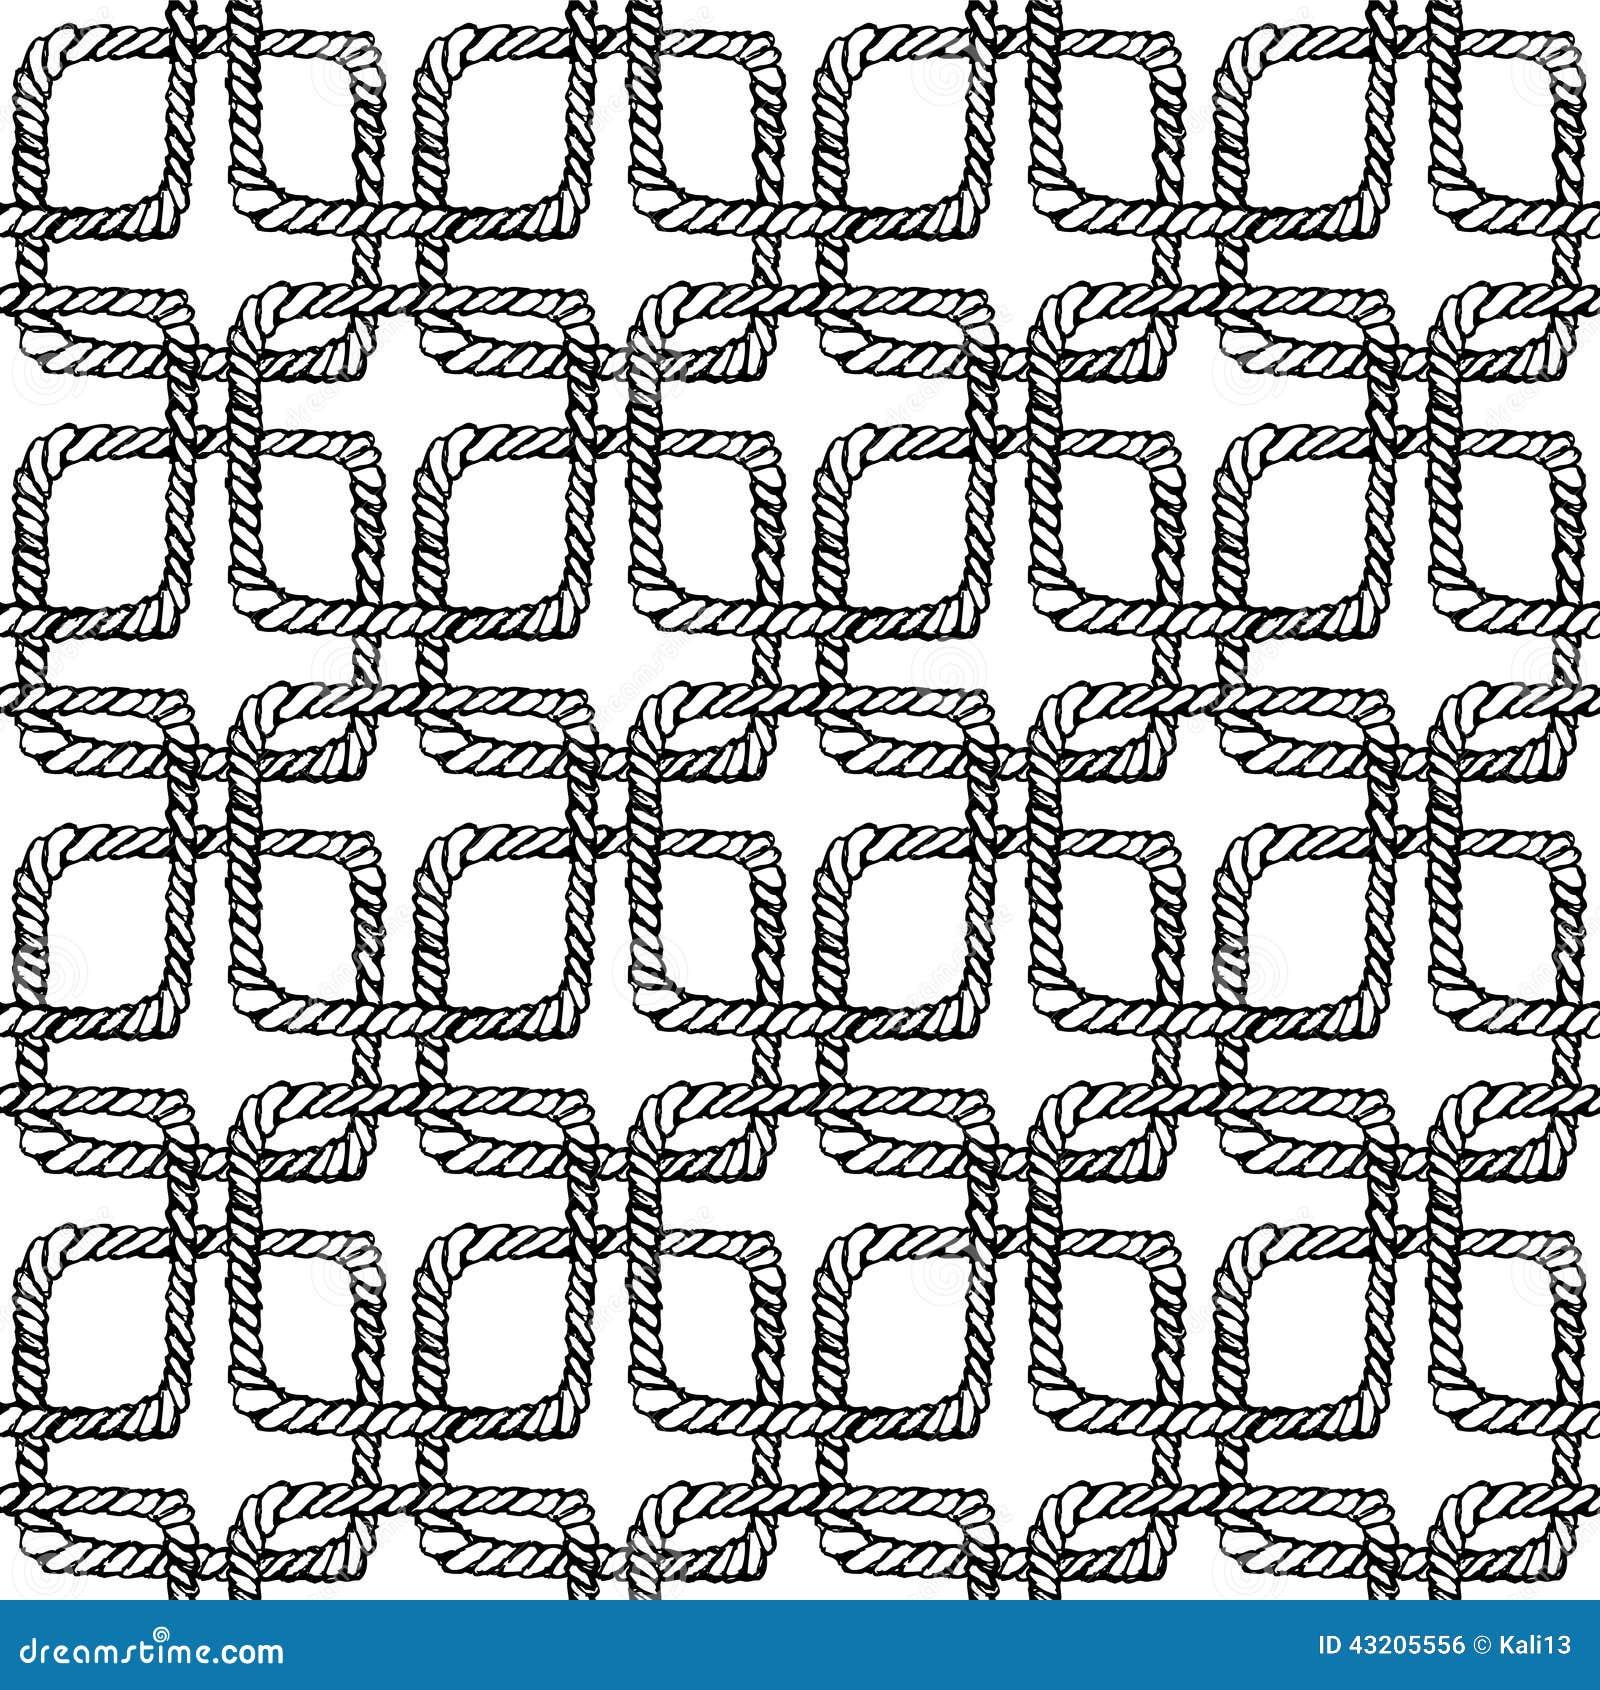 Download Abstrakt Bakgrund I Tappningstil Stock Illustrationer - Illustration av illustration, gravyr: 43205556